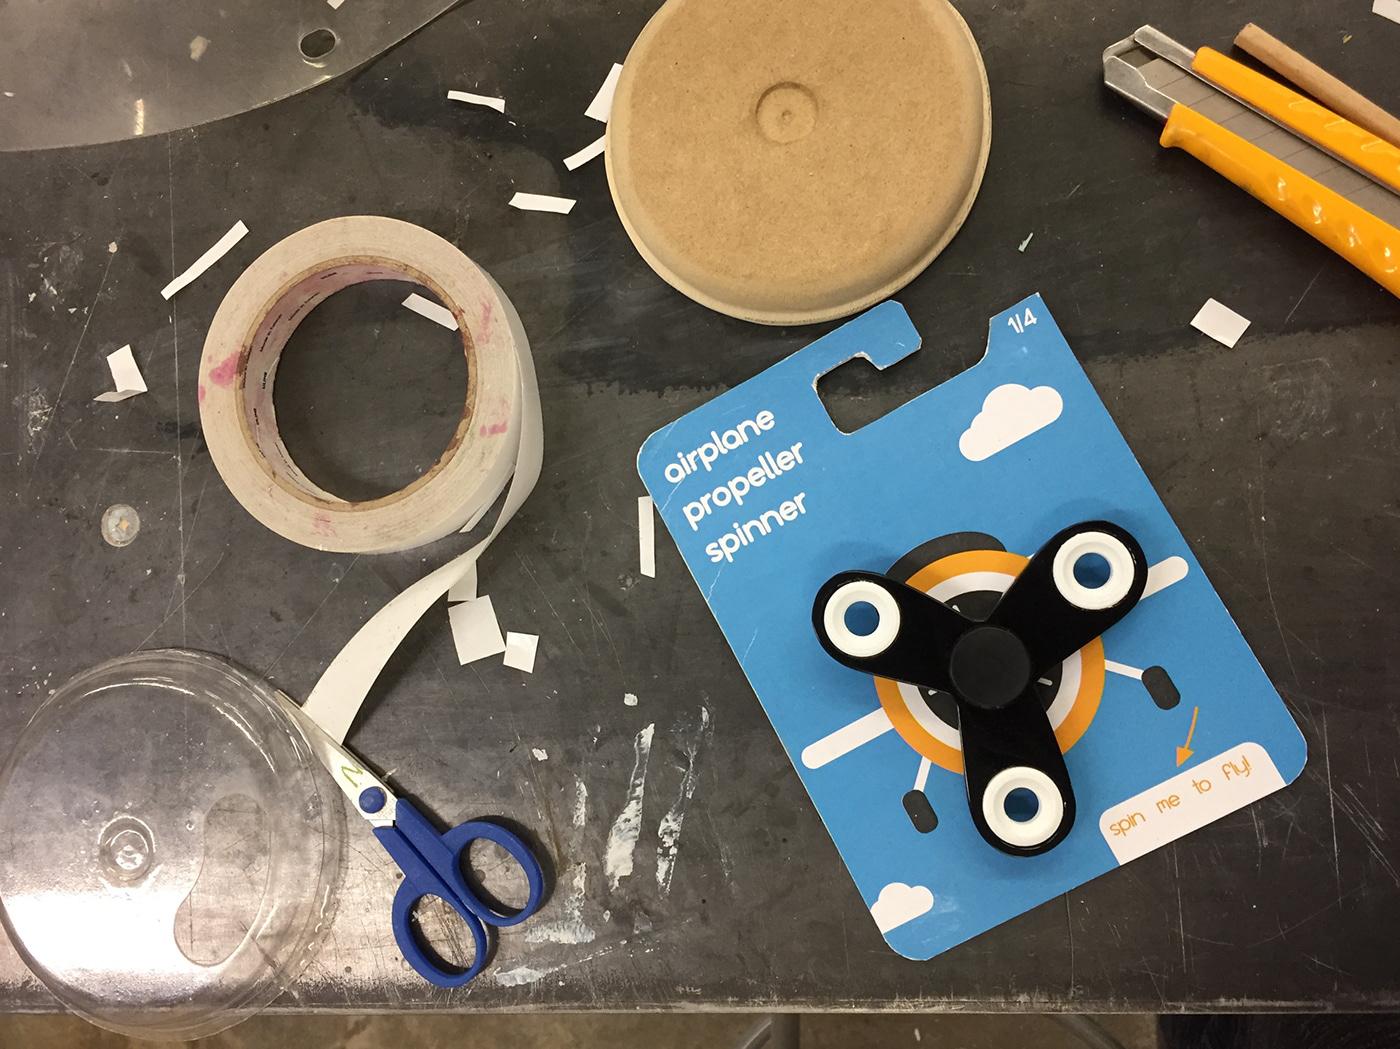 adobeawards productdesign Packaging graphicdesign playfuldesign vacuumforming